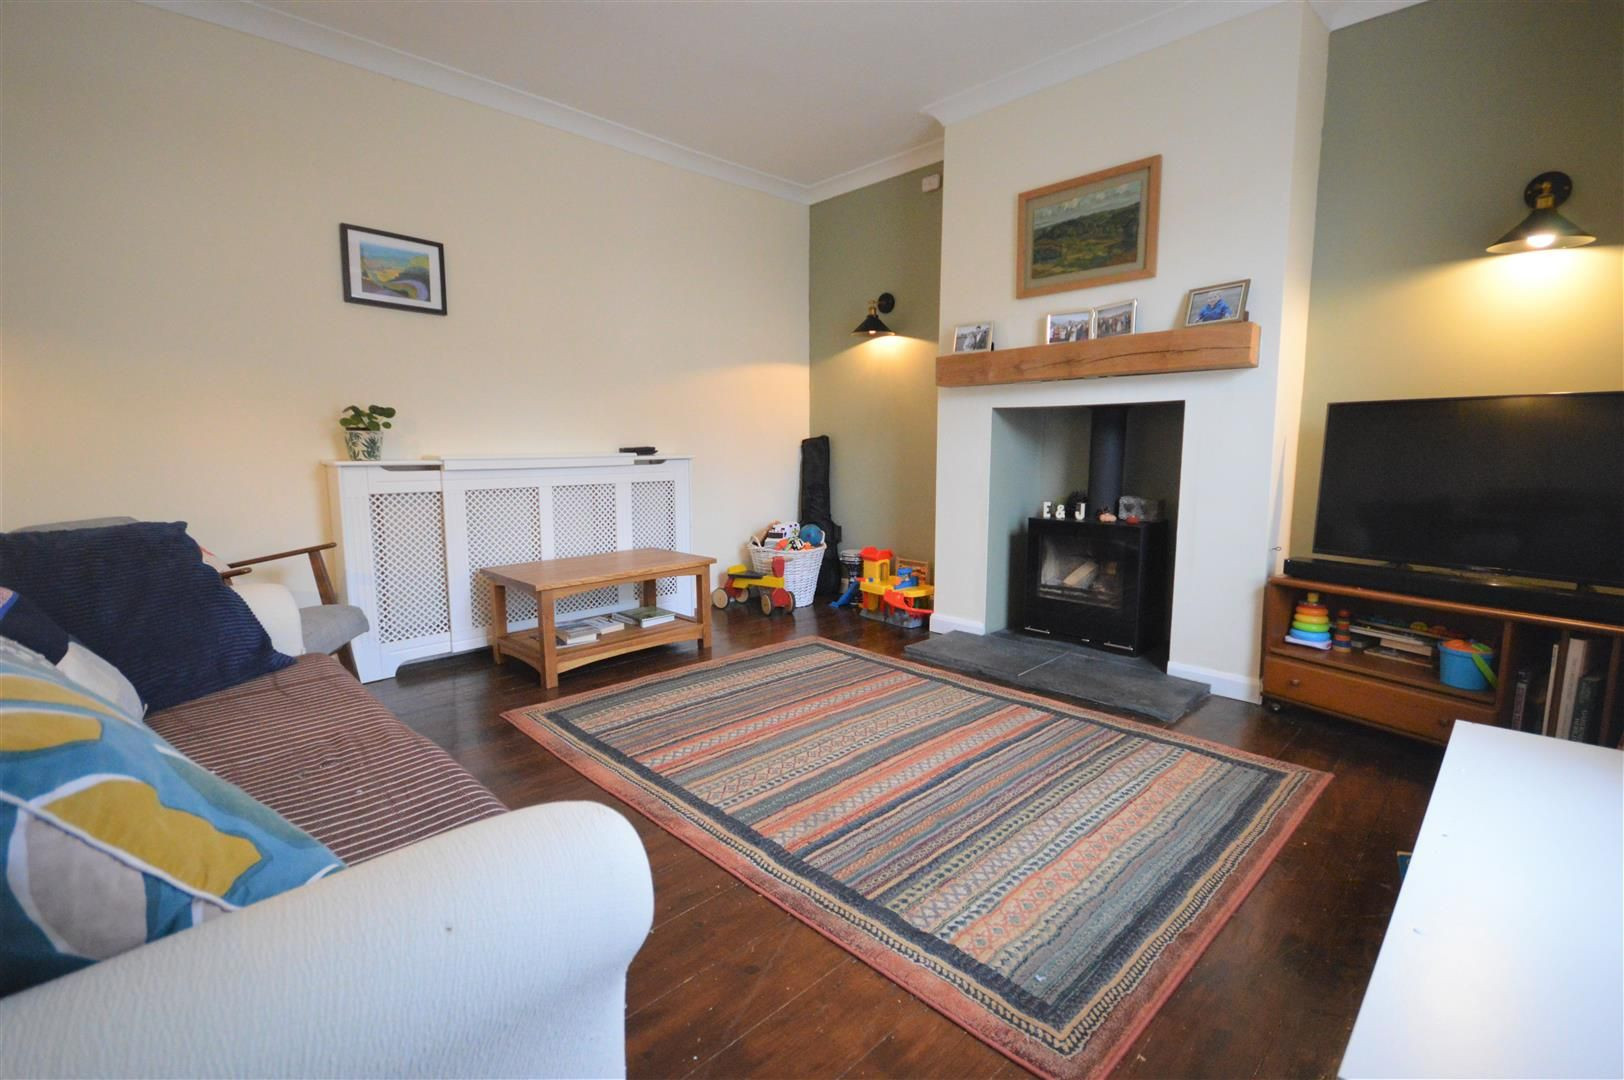 3 bed detached for sale in Leominster  - Property Image 4